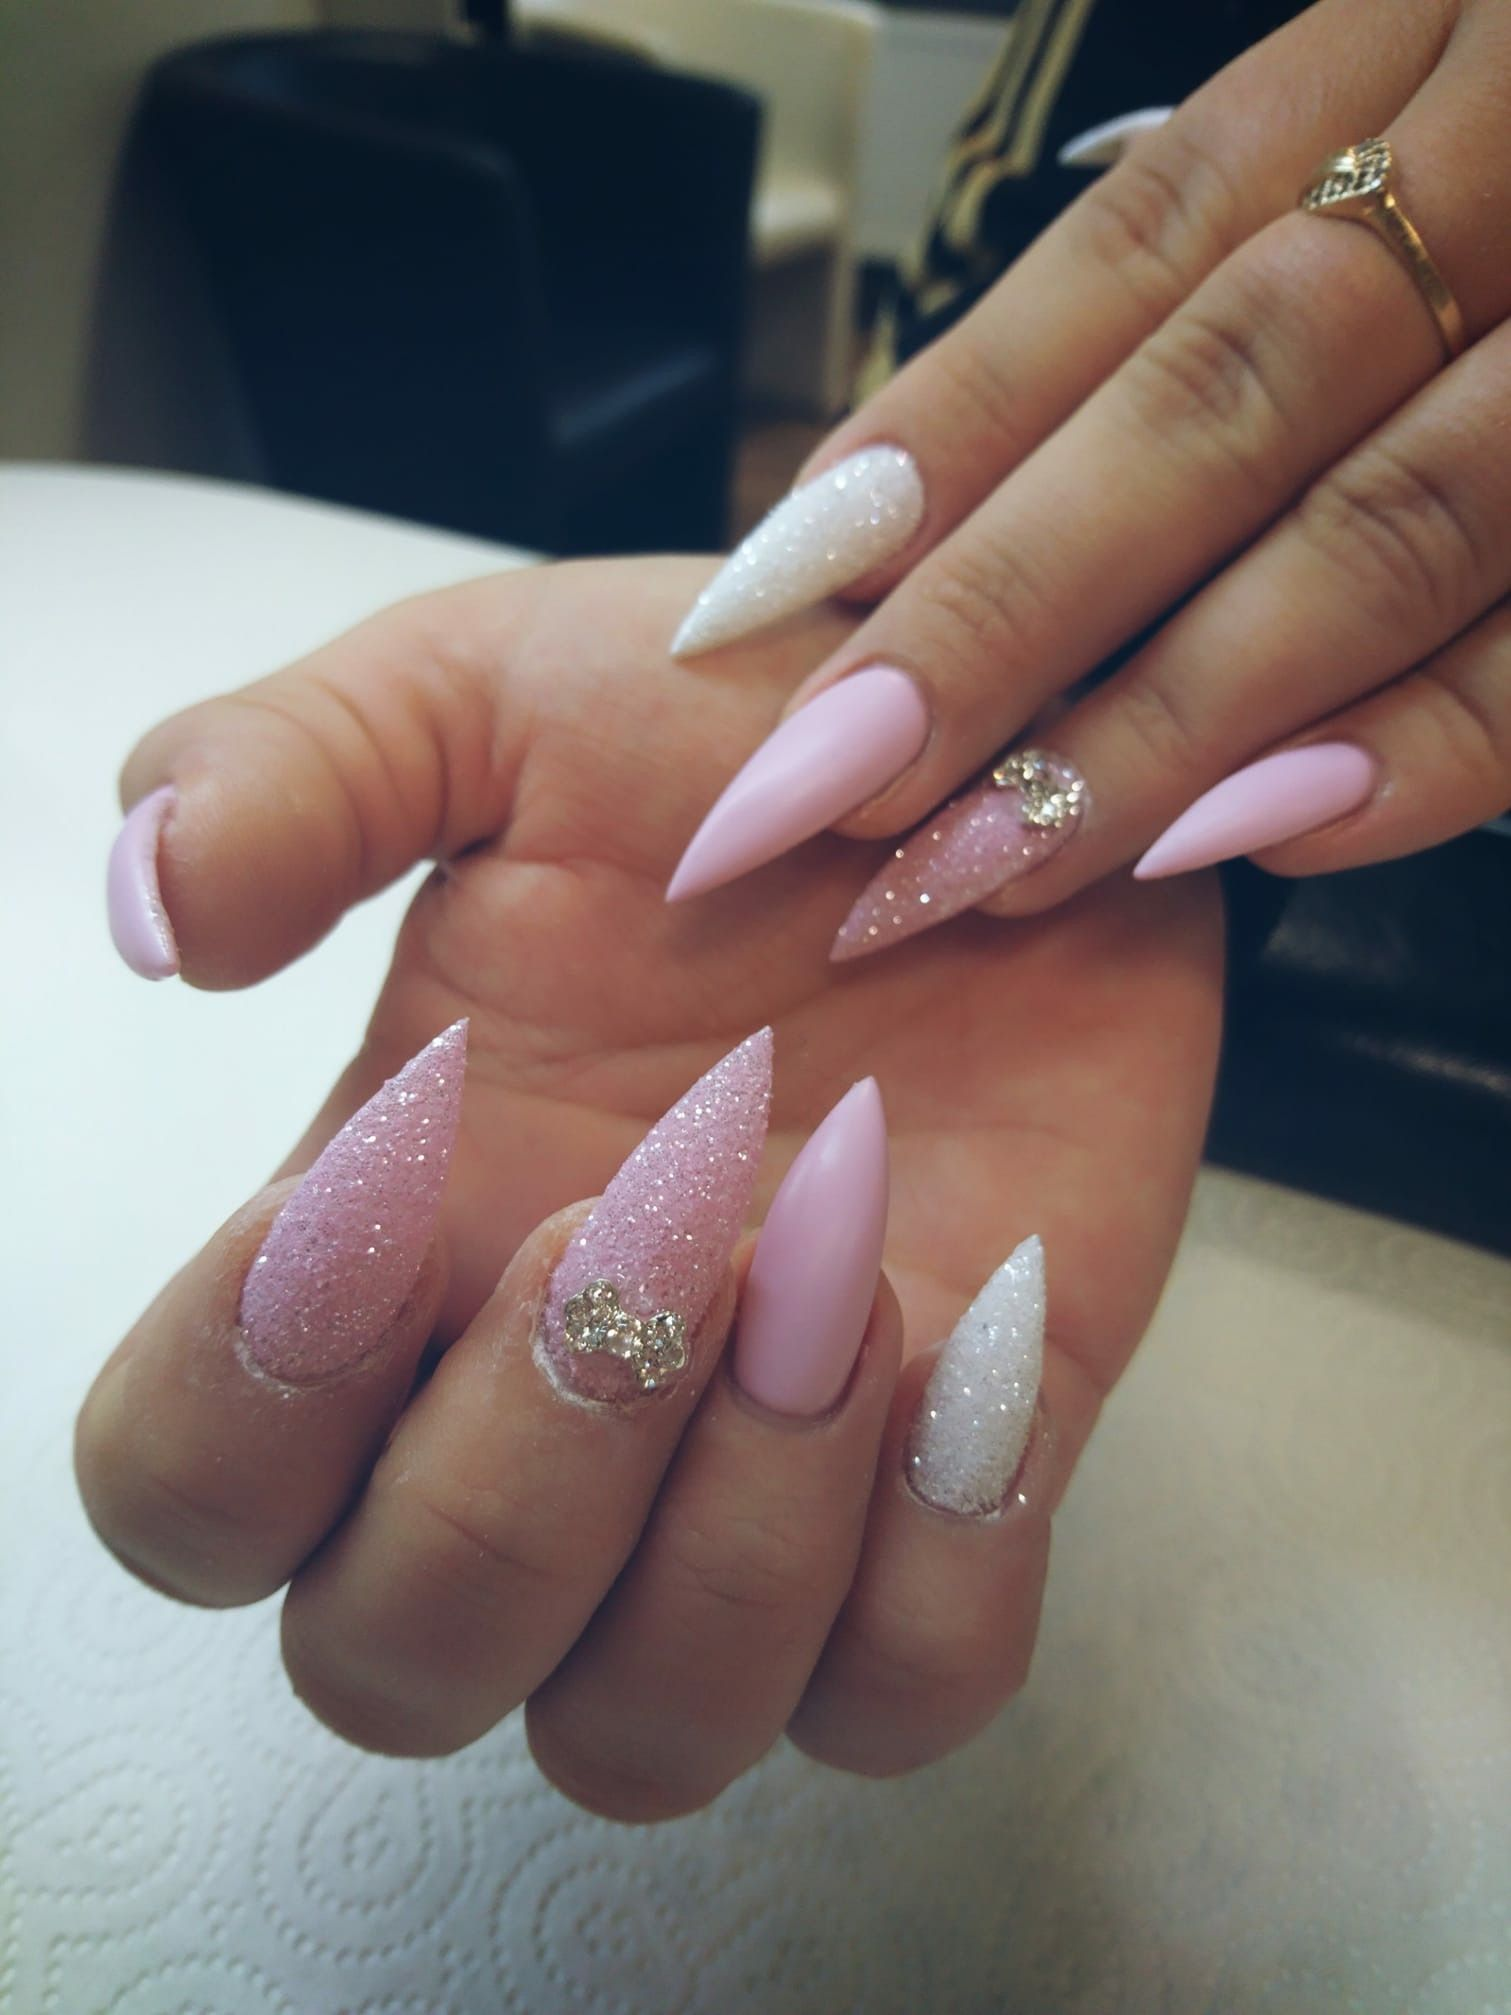 Pin by Tatjana Pusch on Nageldesign | Pinterest | Natural nails ...